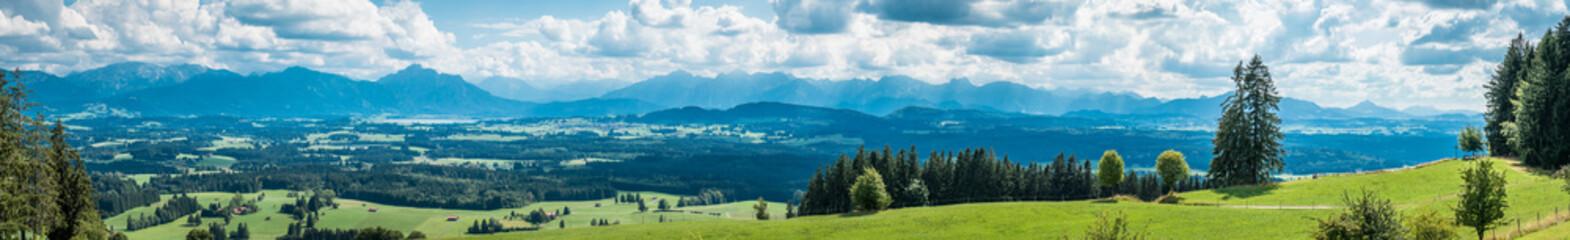 auerberg mountain